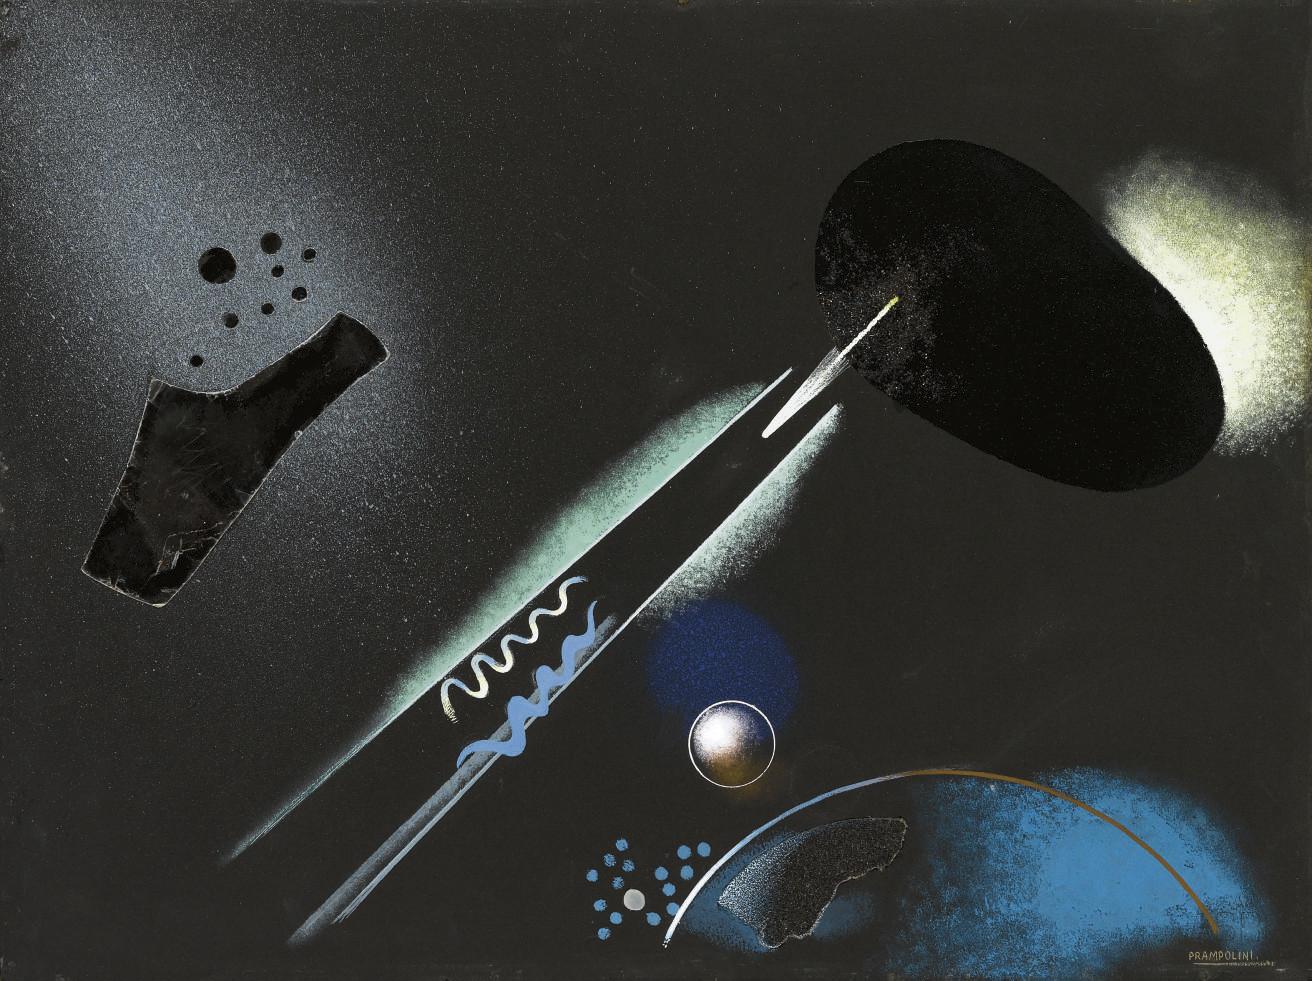 Paesaggio cosmico o Metamorfosi cosmica